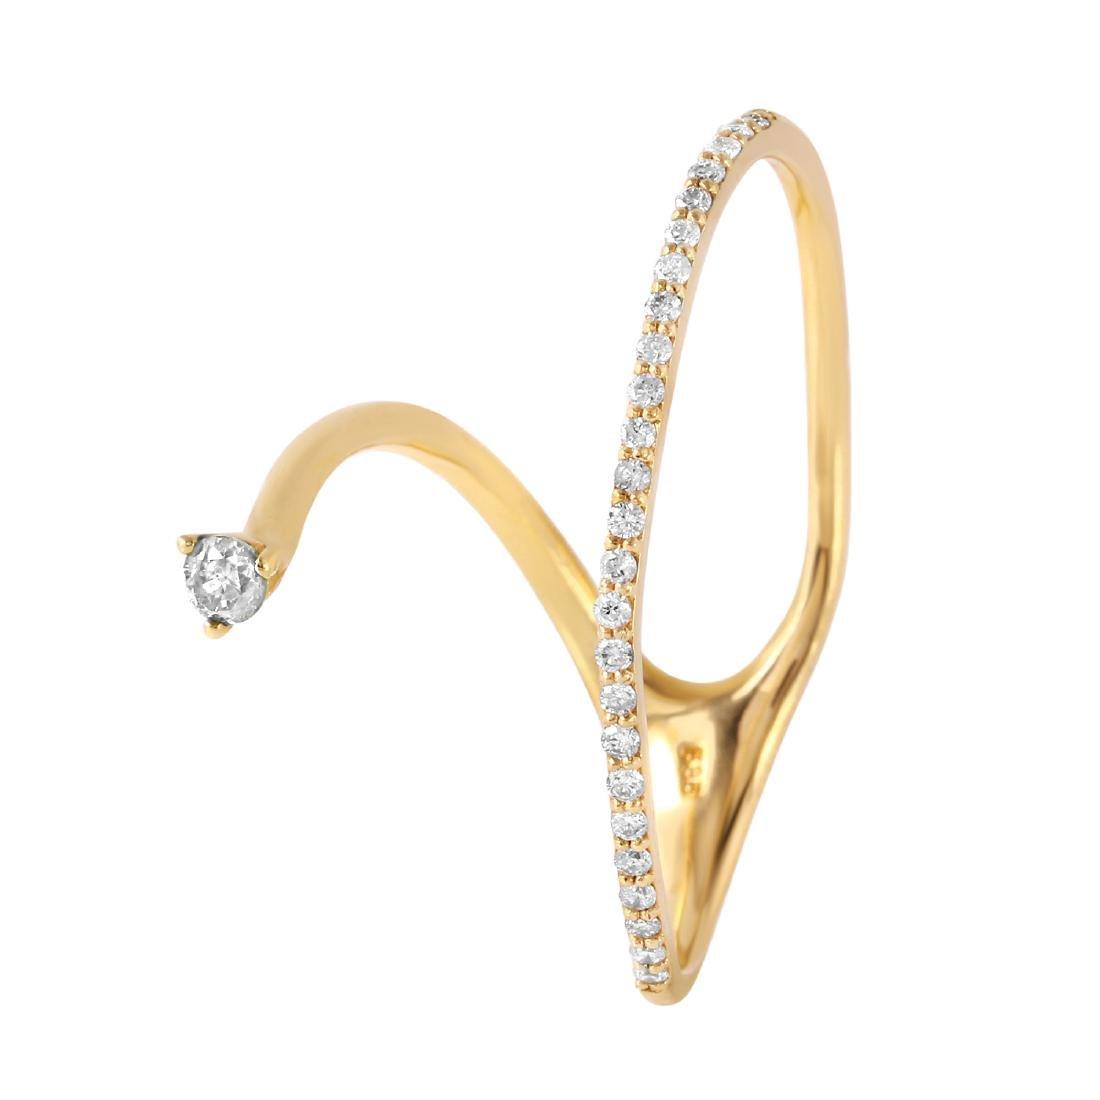 0.25 Carat Natural Diamond 18K Solid Yellow Gold Ring